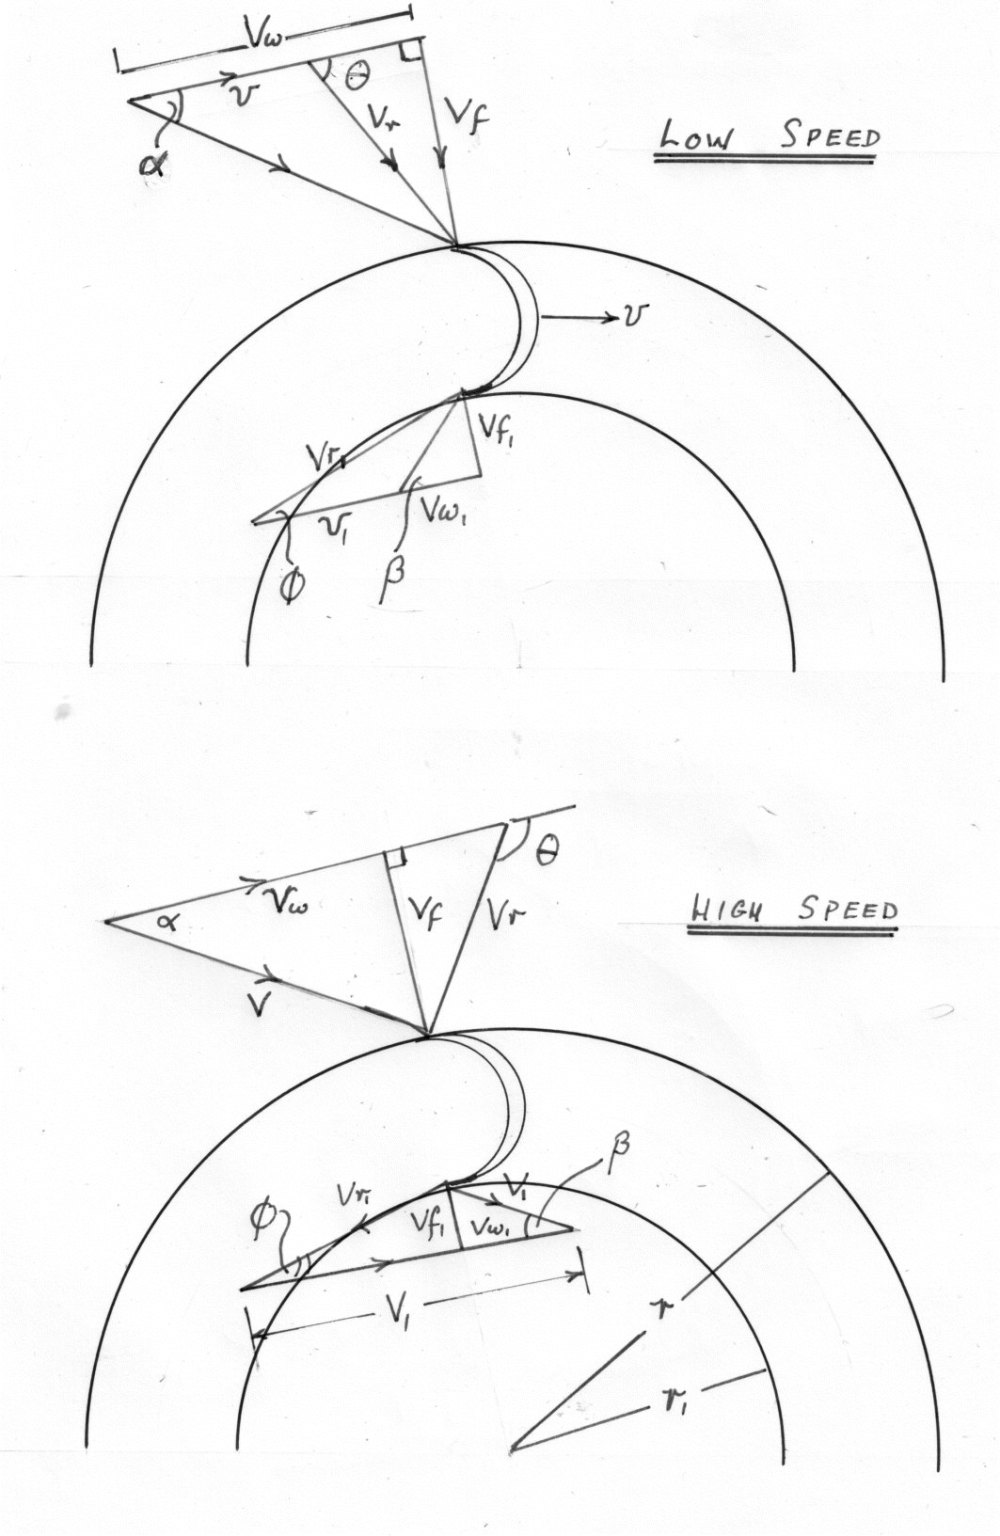 medium resolution of impulse and reaction turbines